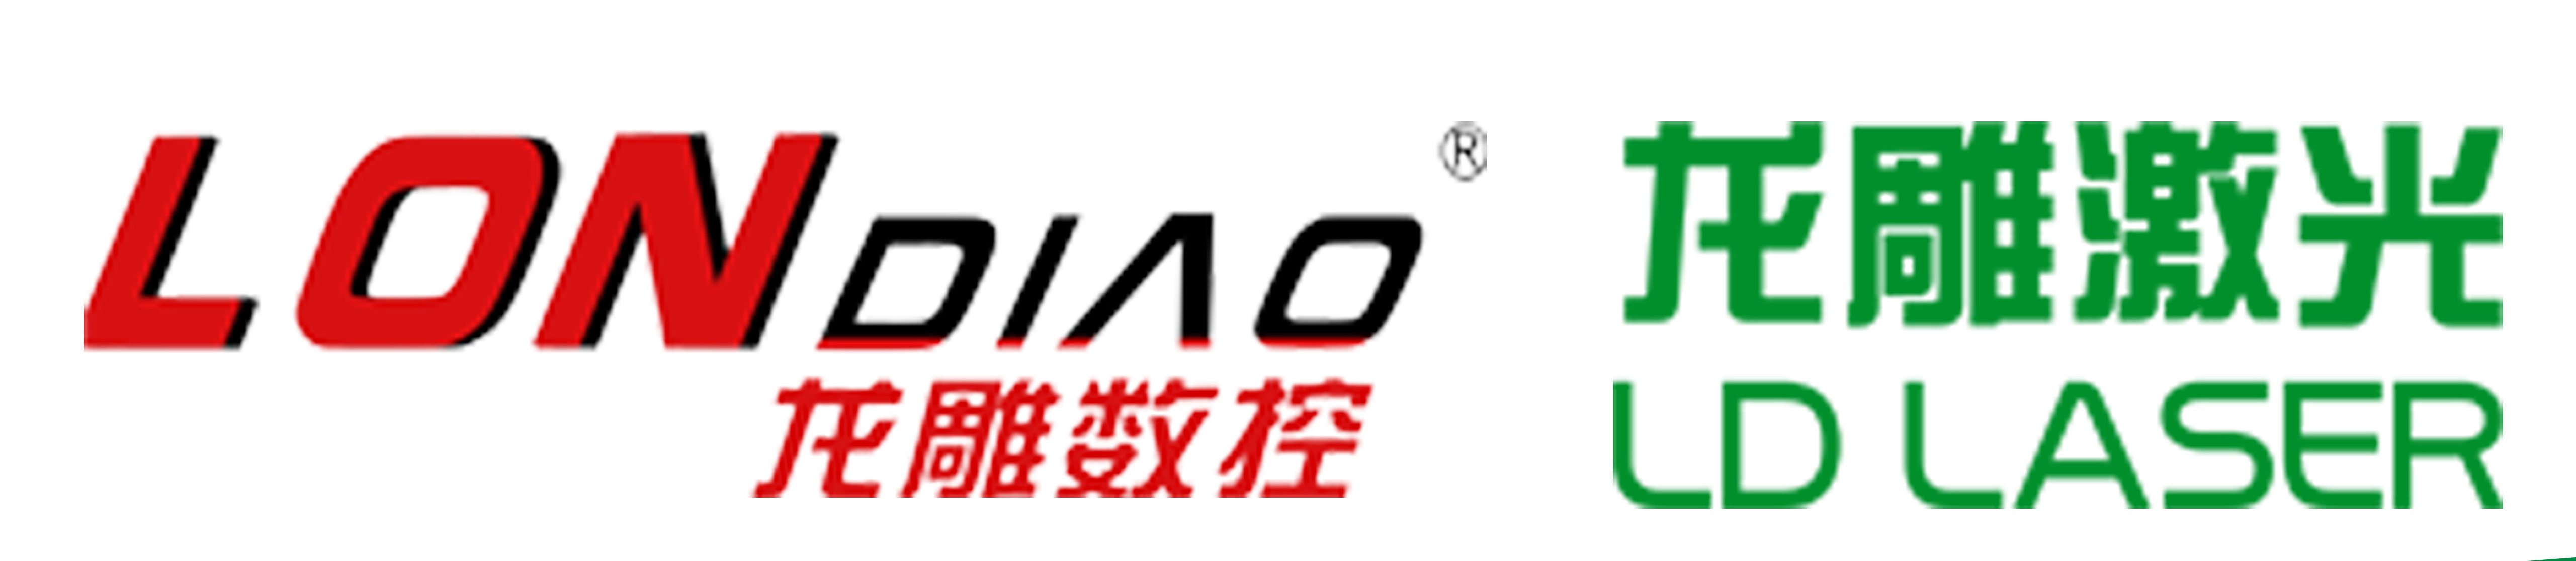 Beijing Longdiao Nc Equipment Co.,LTD.